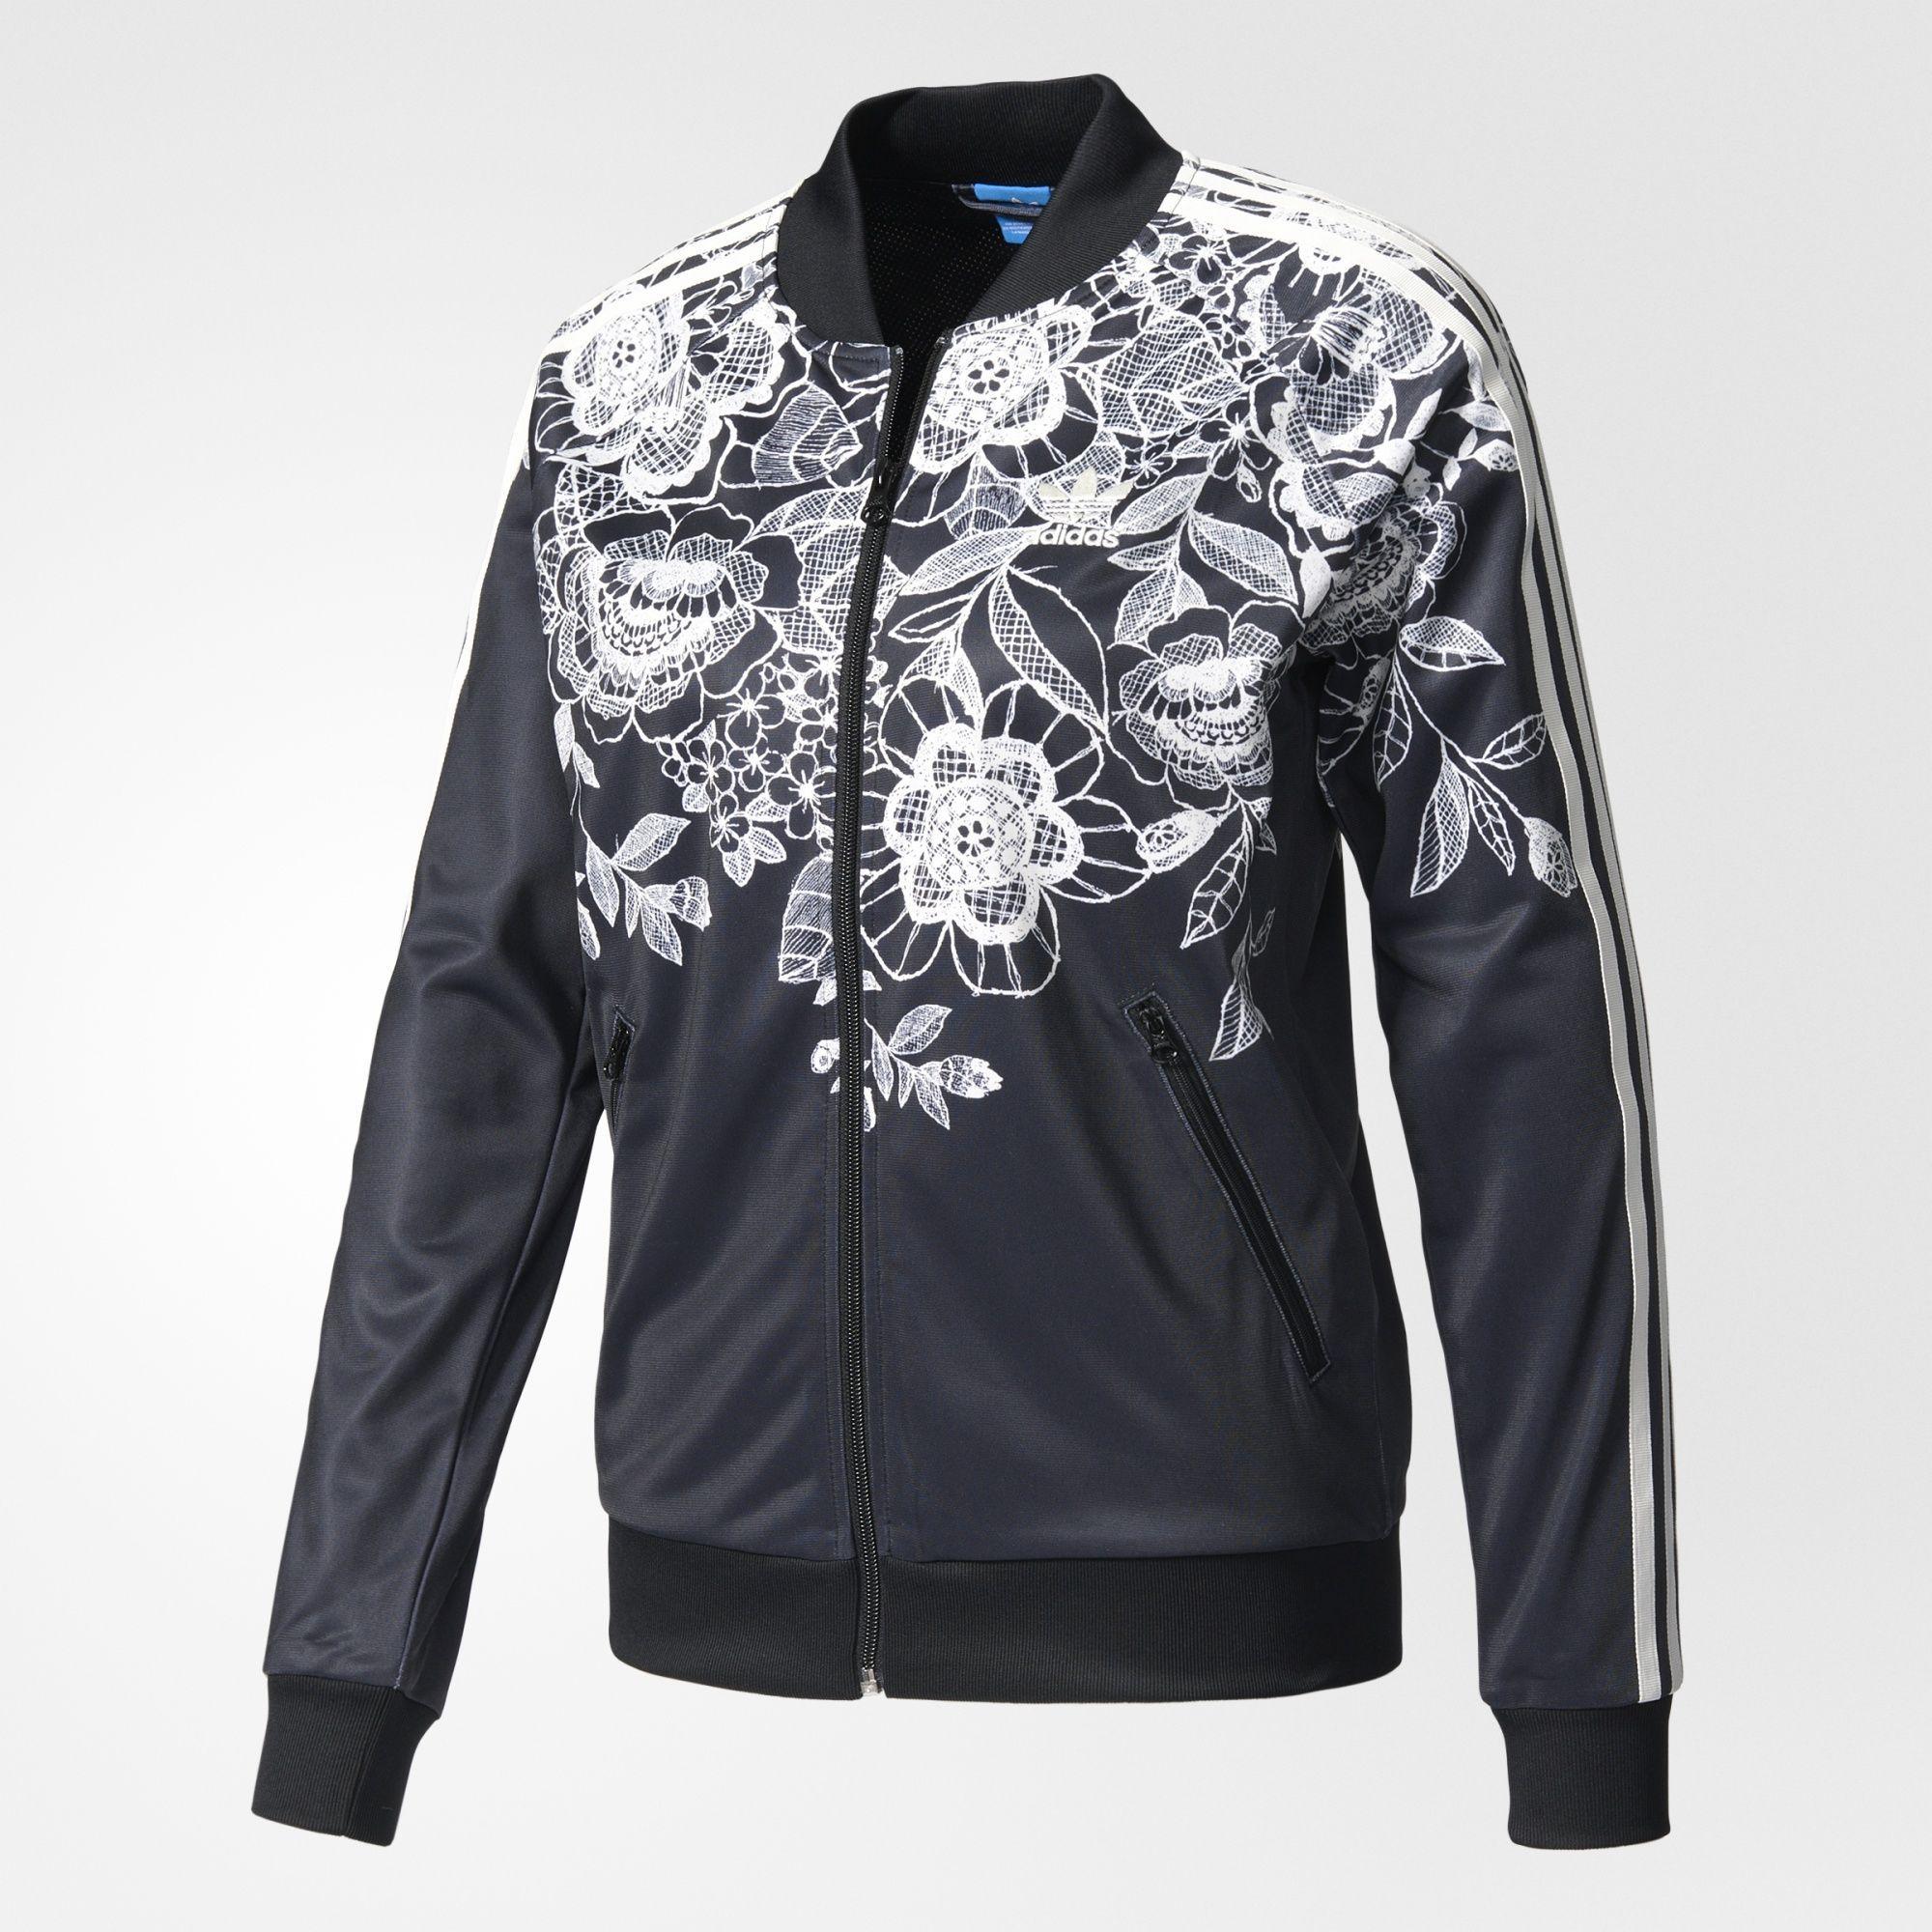 adidas - Florido Superstar Track Jacket   Style   Adidas, Jackets ... c0ac22e73e